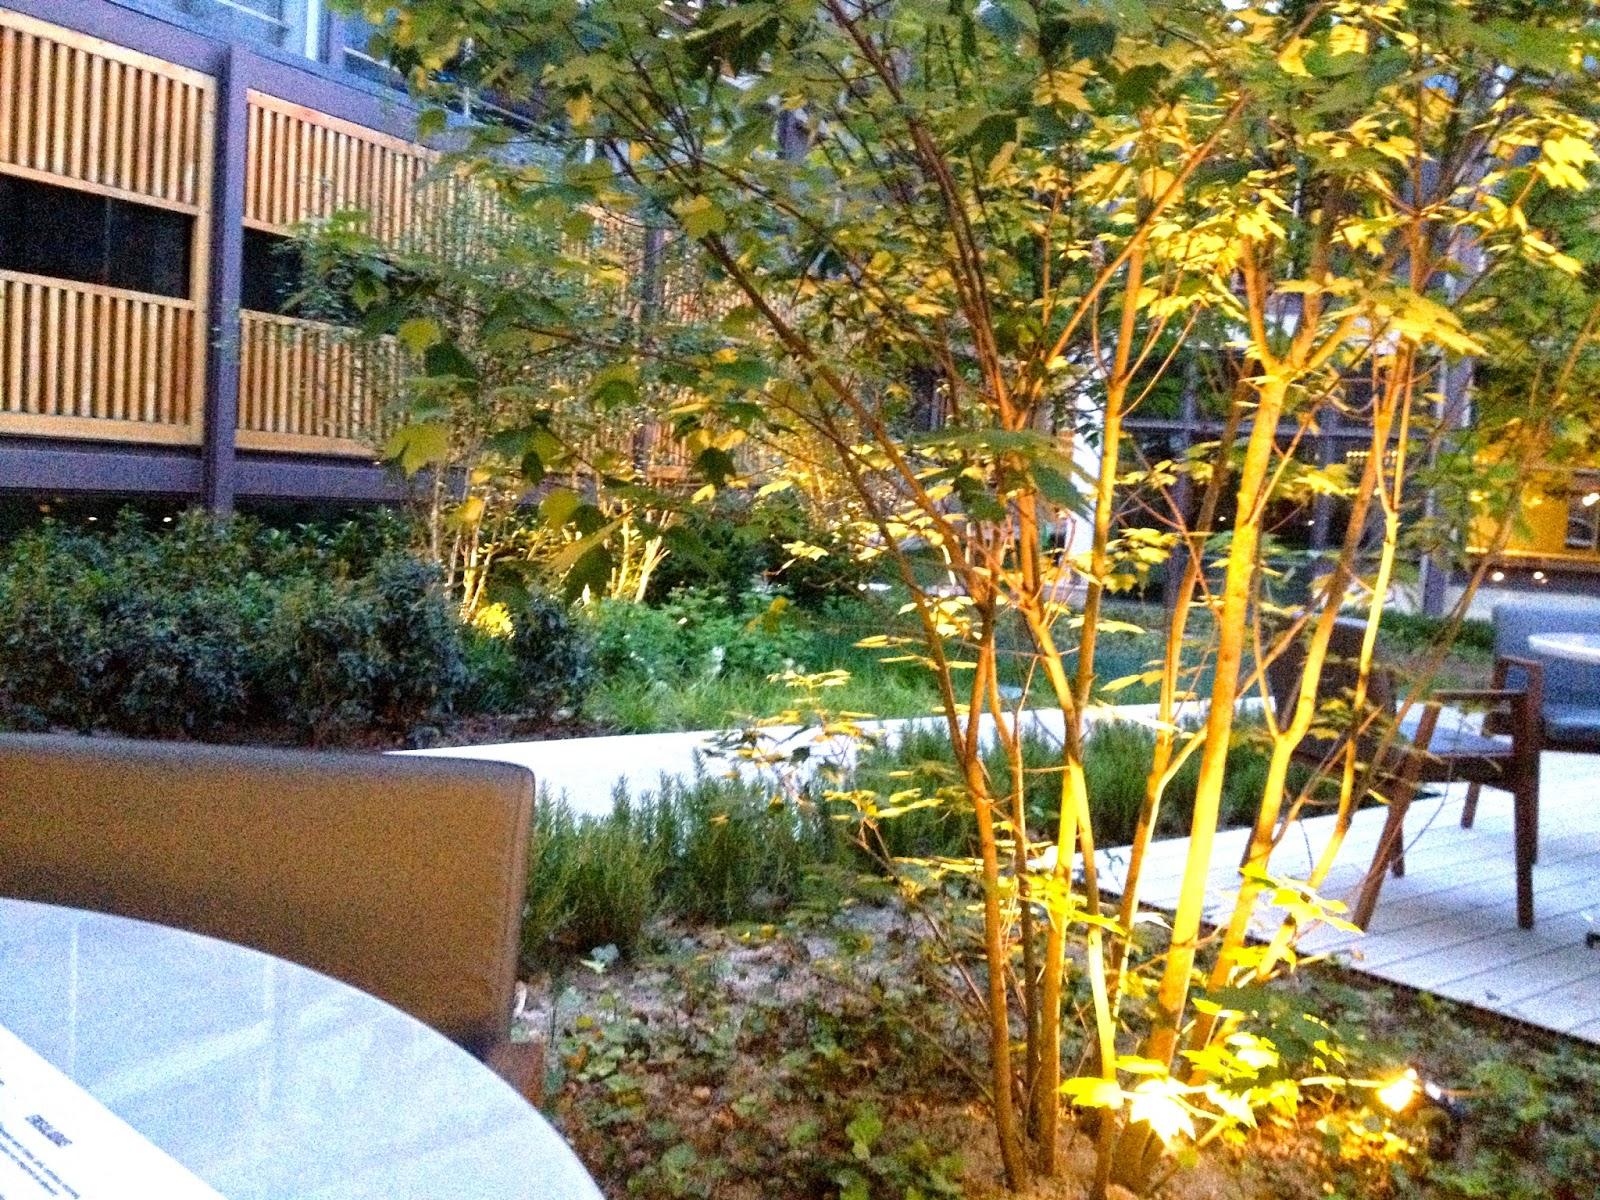 Bosco de Lobos, madrid, restaurante, chueca, malasaña, pasta pizza colegio arquitectos terraza